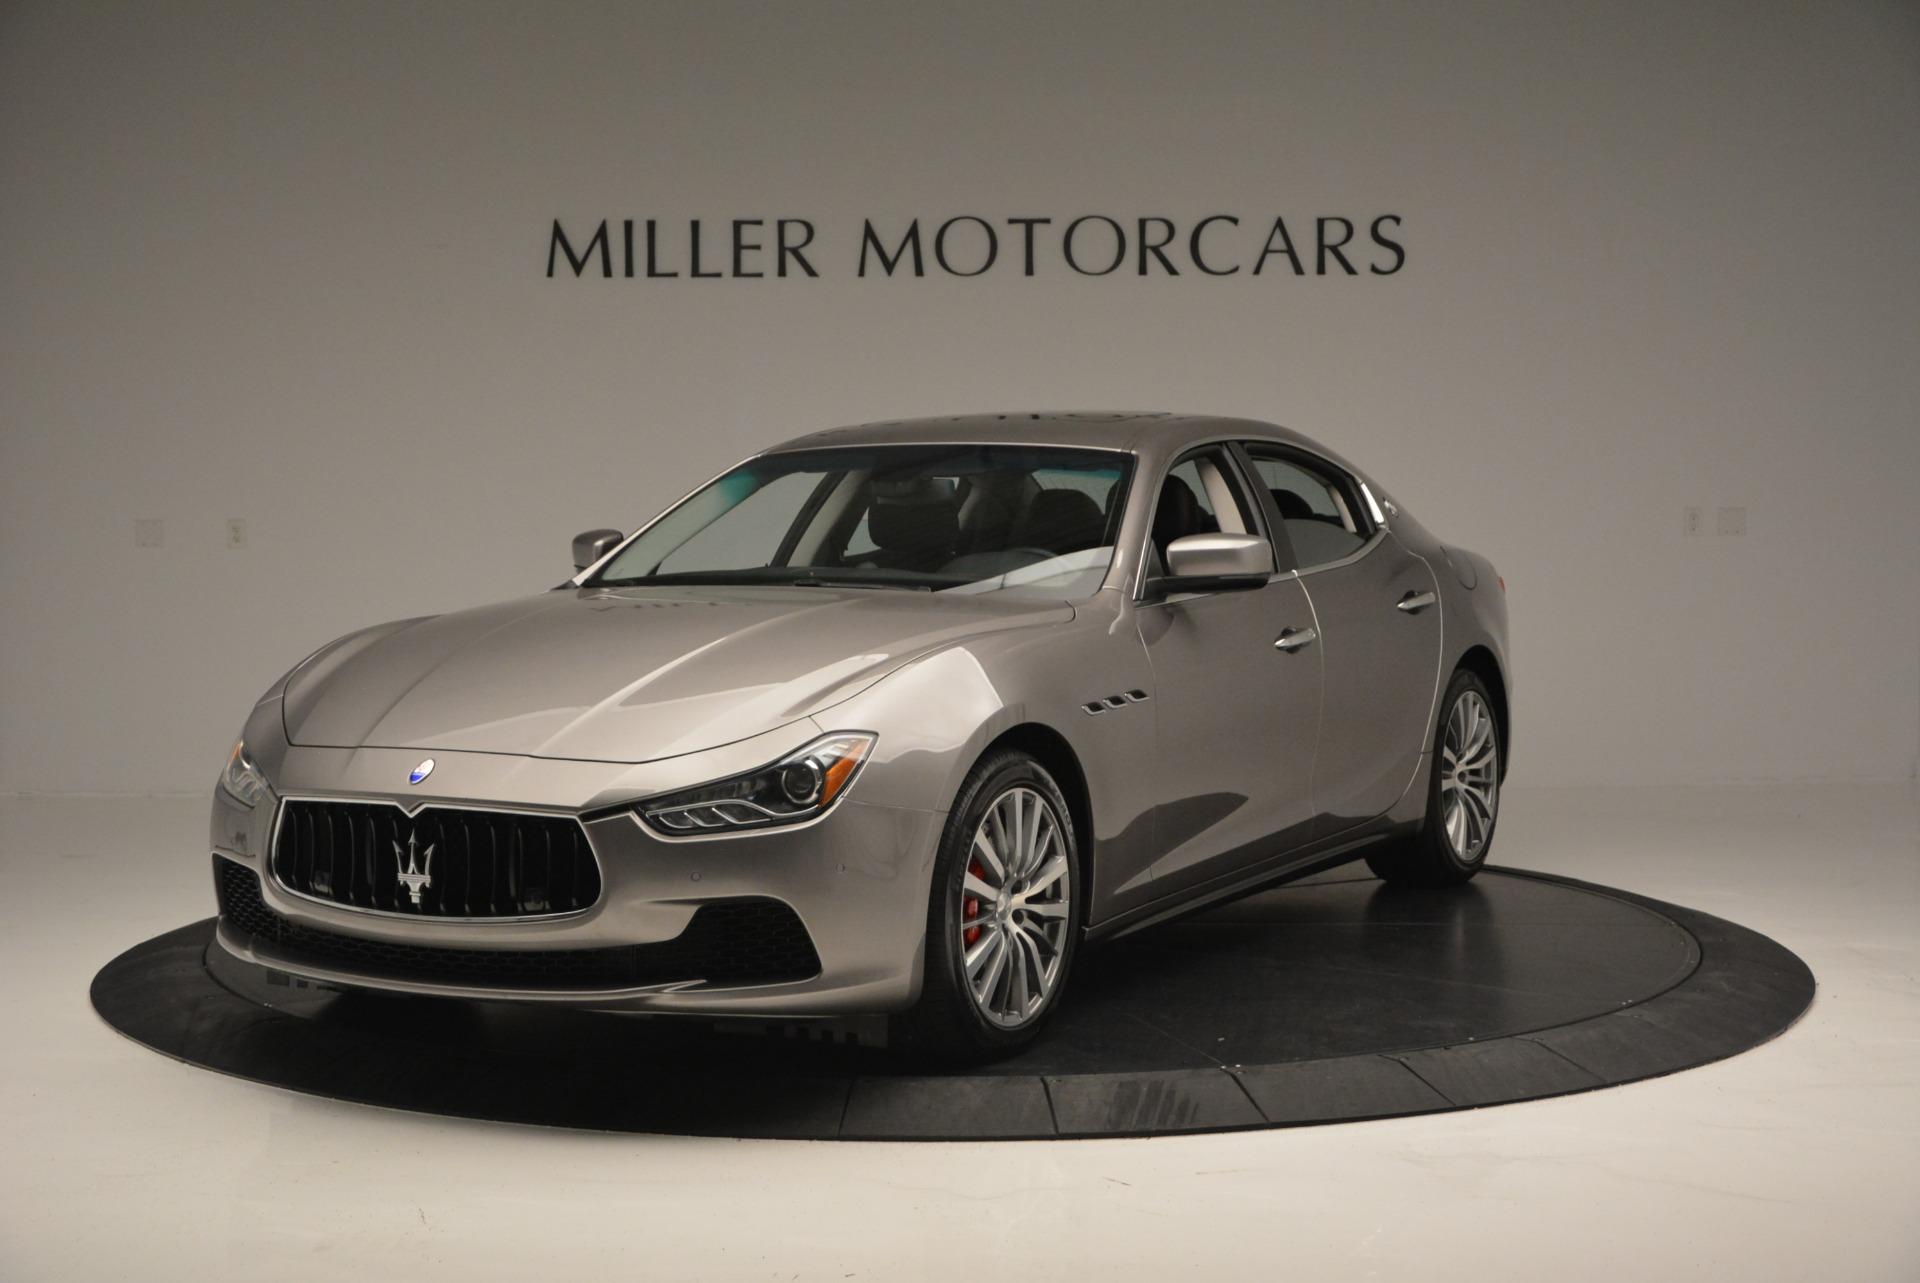 New 2017 Maserati Ghibli S Q4 For Sale In Greenwich, CT 848_main